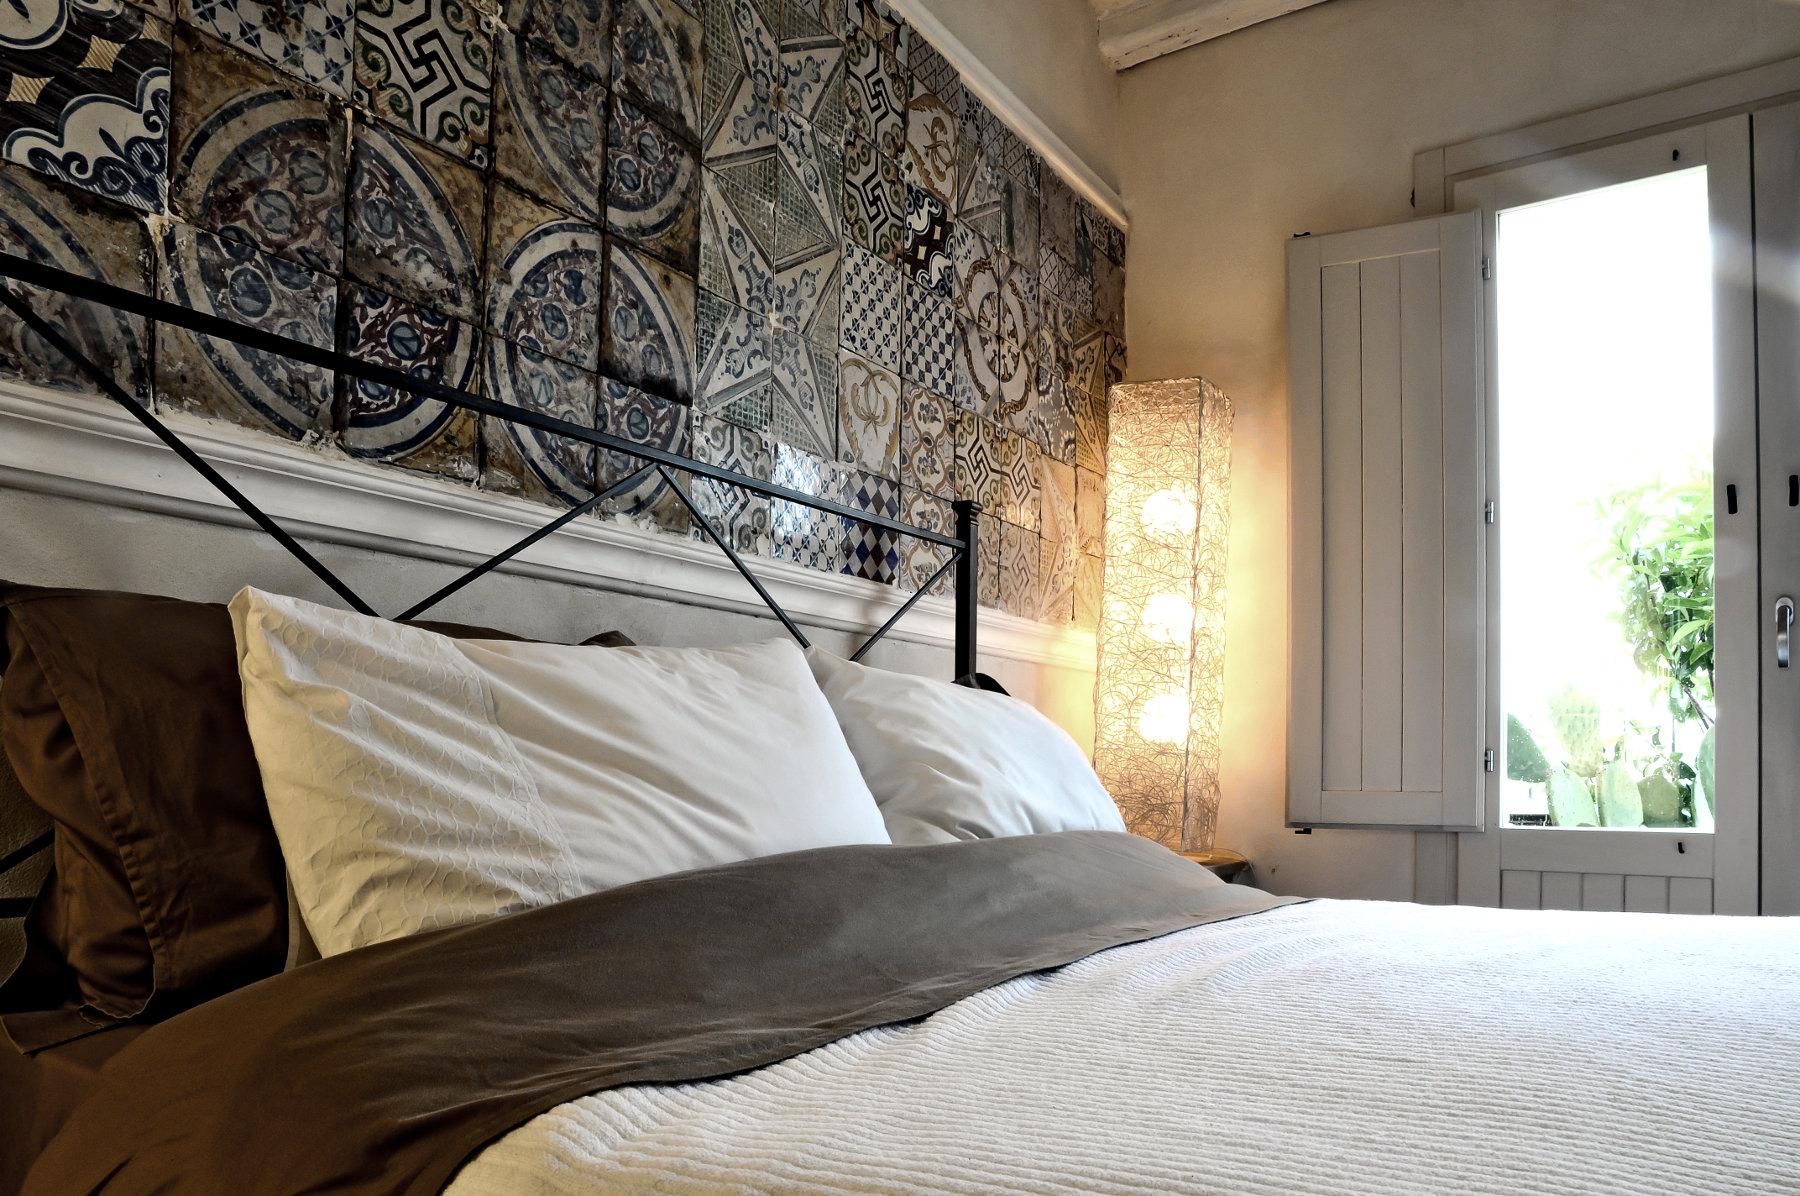 Anime a Sud Sicilia Holiday Sicily residenze di charme lusso luxury hotel